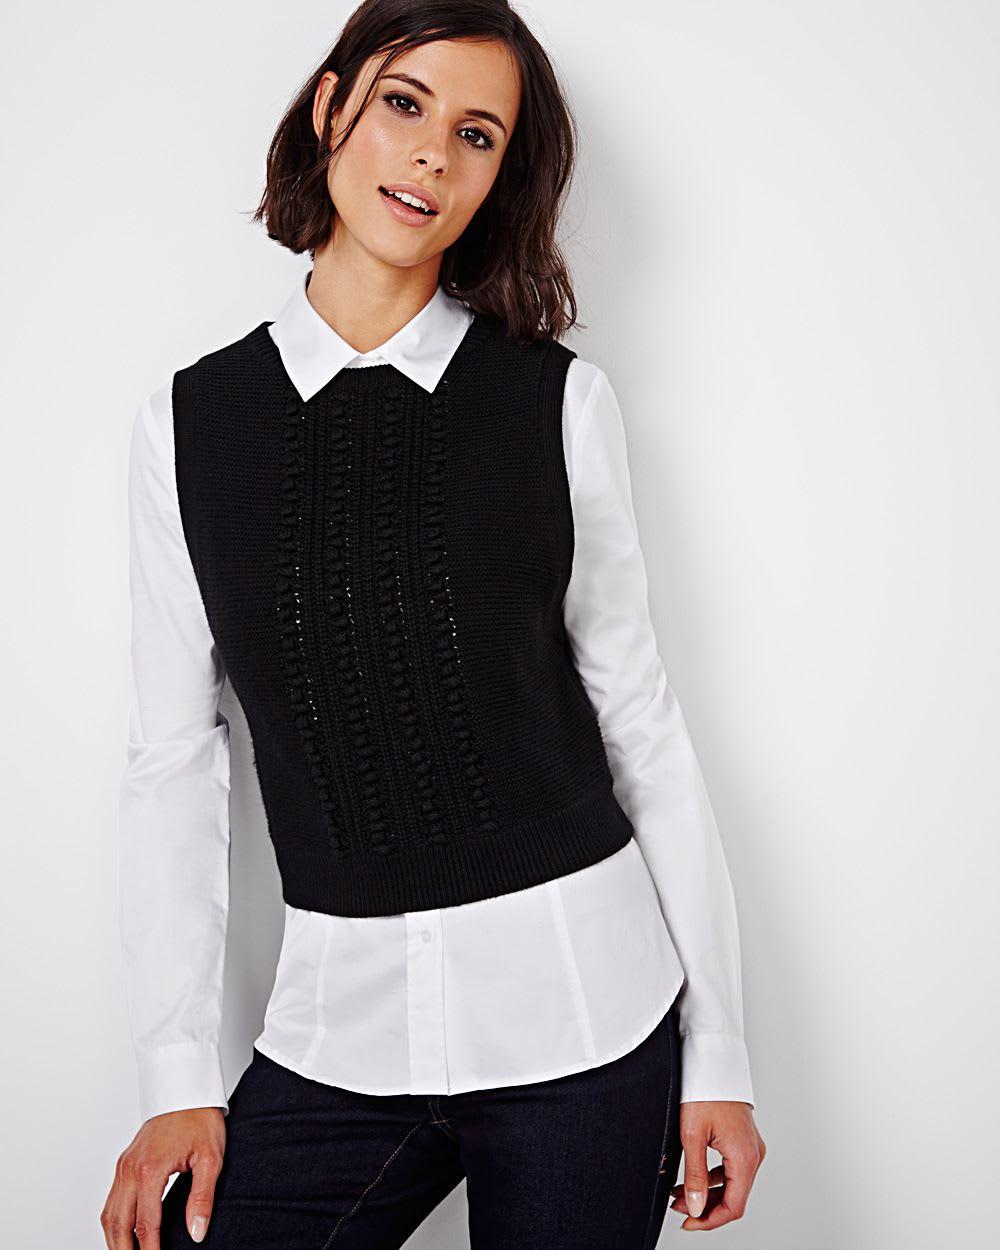 Womens Black Sweater Vest